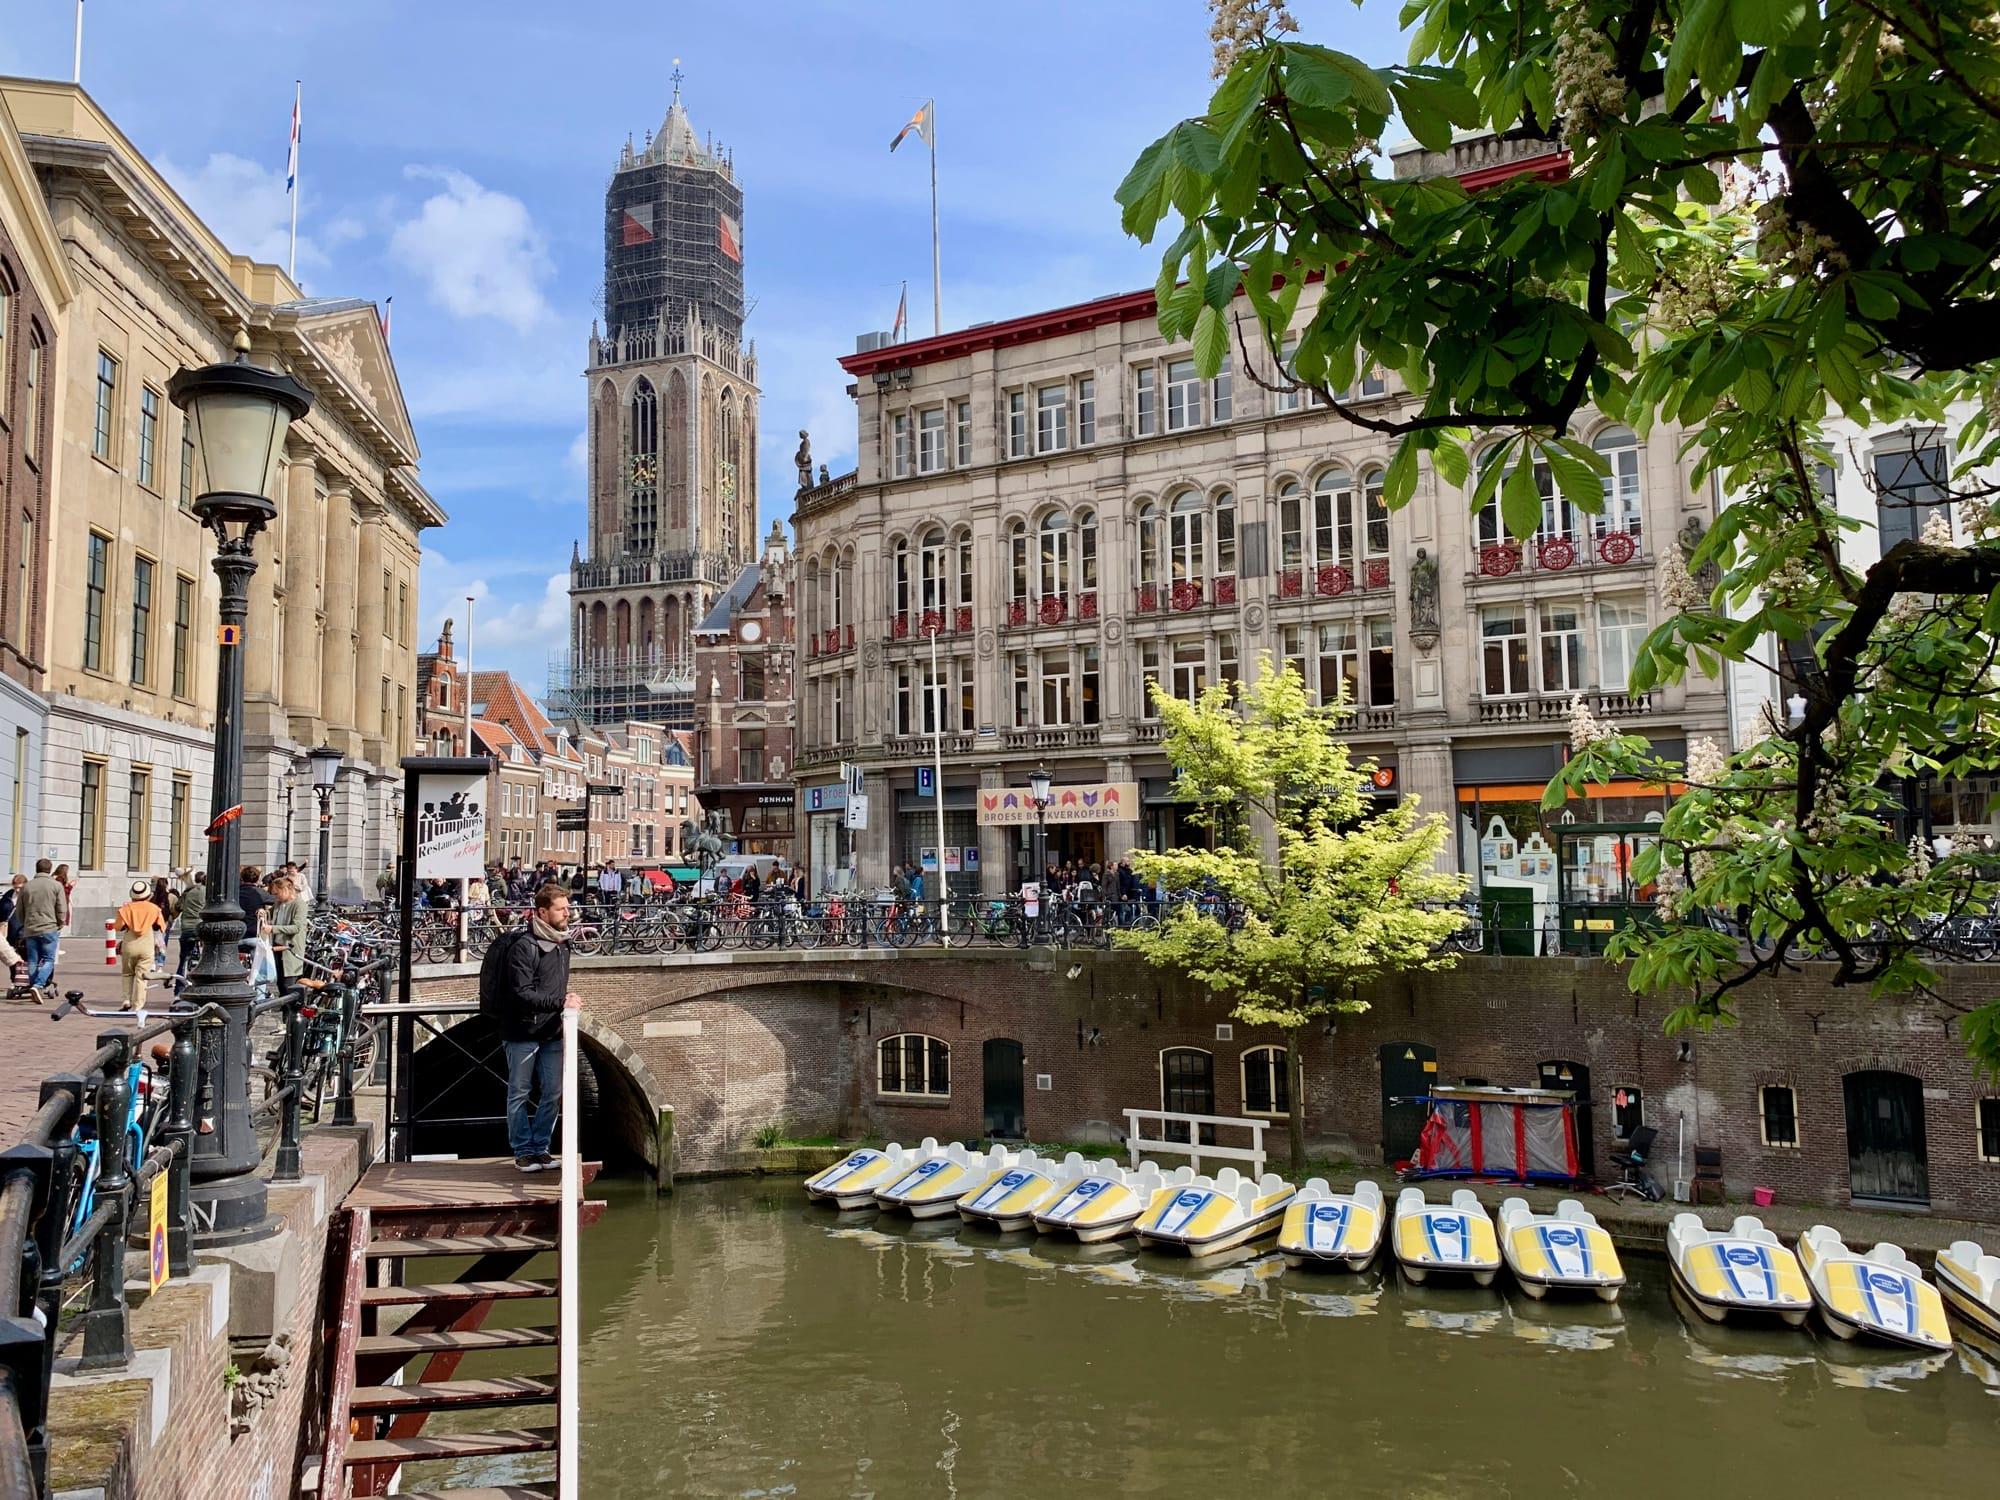 Le città dei canali: Utrecht, Delft e Haarlem